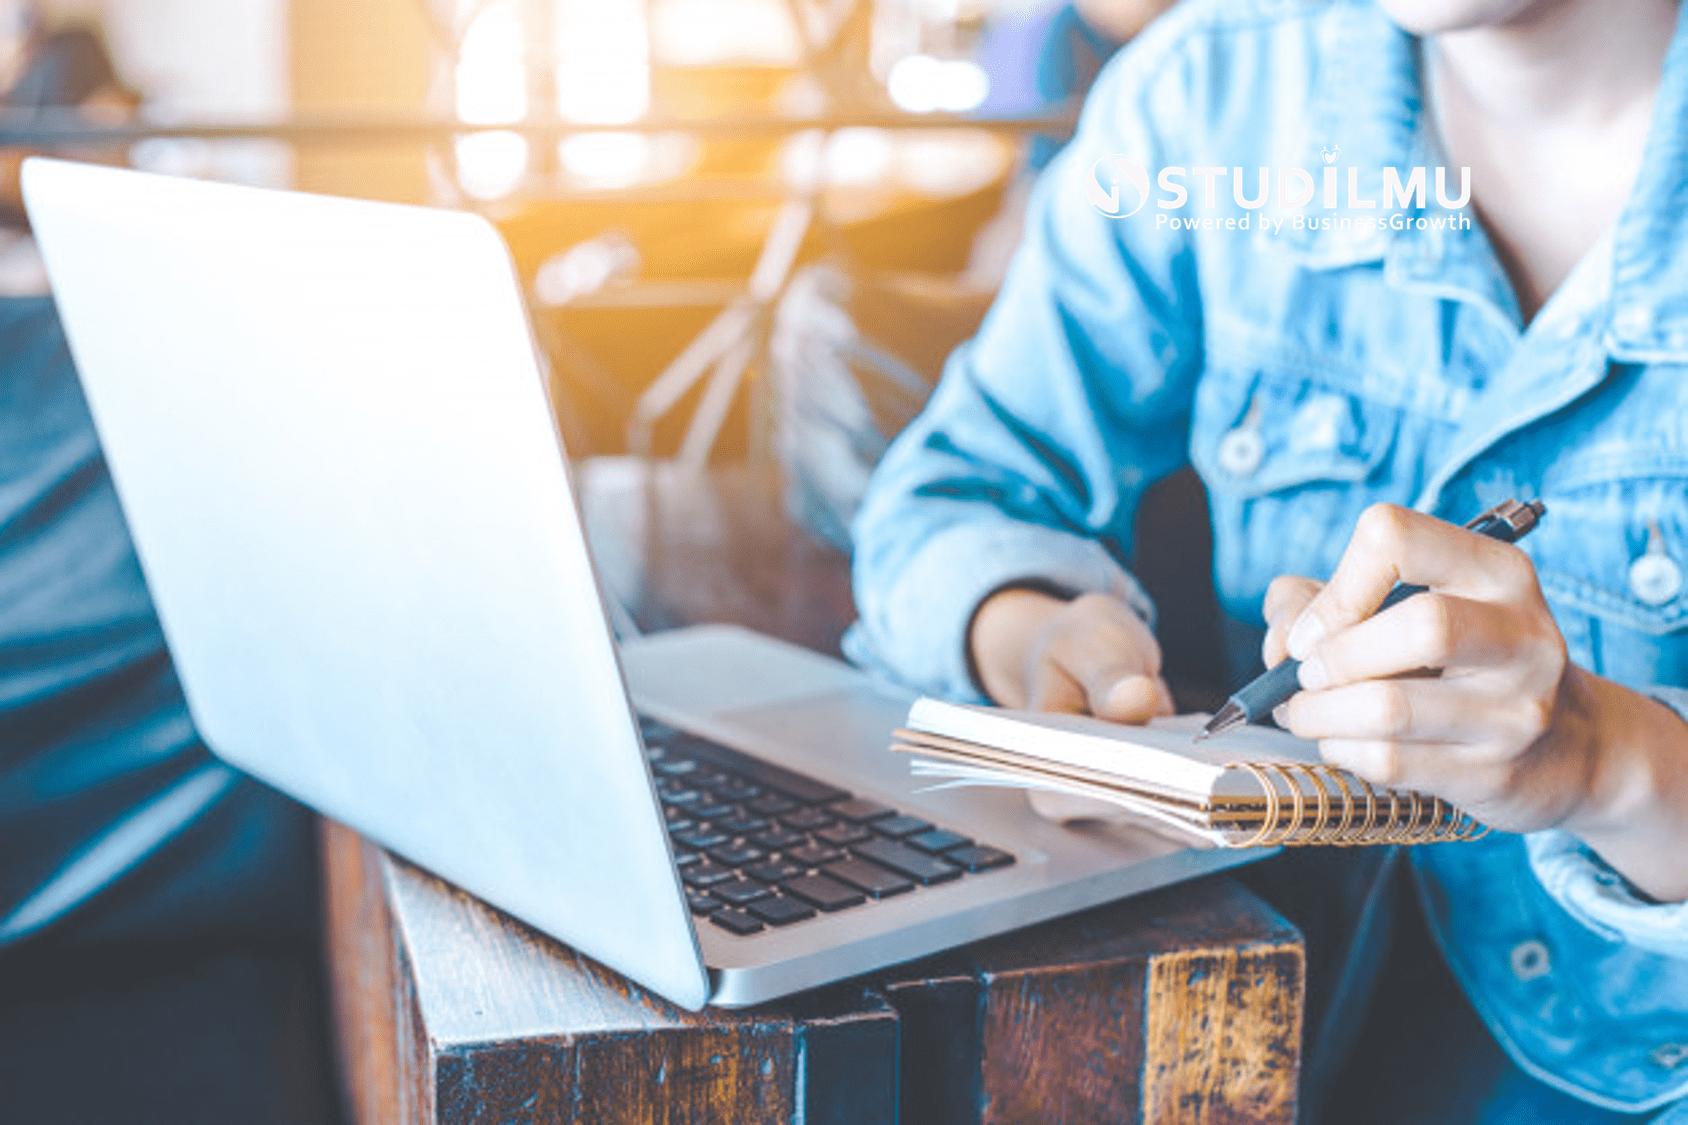 STUDILMU Career Advice - Bagaimana Cara Mengembangkan E-Learning atau Pembelajaran Online?